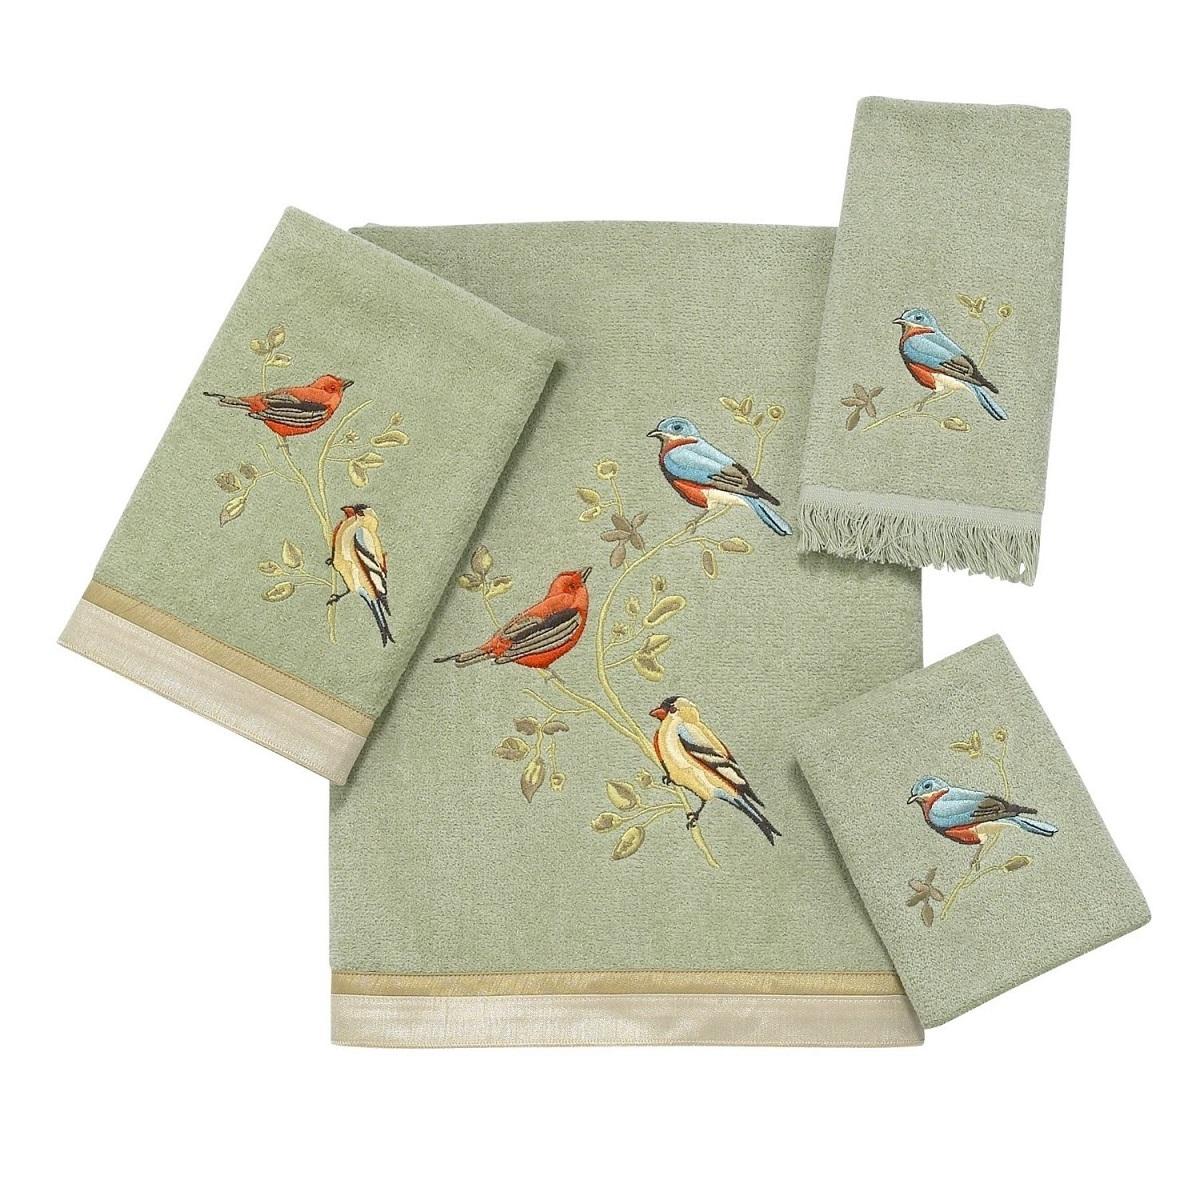 Полотенца Полотенце 28х46 Avanti Gilded Birds зеленое elitnoe-polotentse-mahrovoe-gilded-birds-zelyonoe-ot-avanti-kanada-nabor.jpg